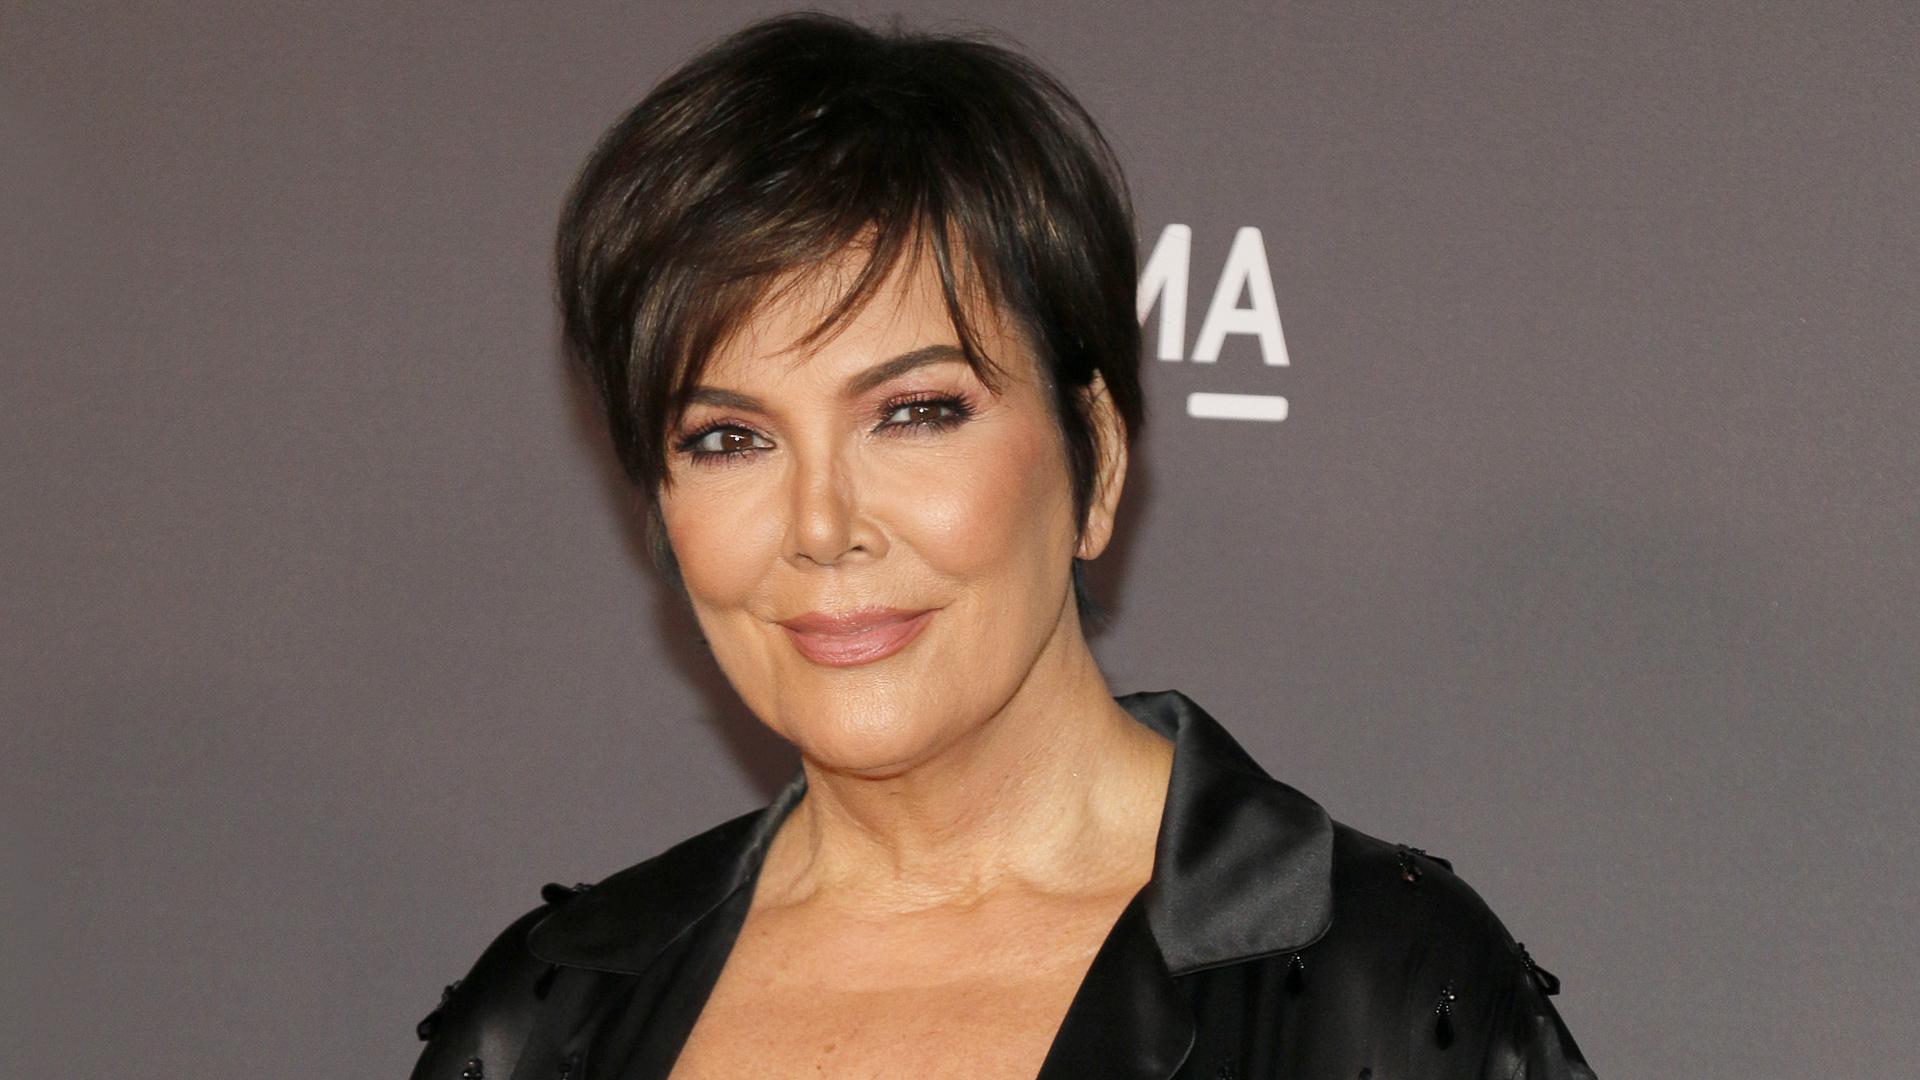 kardashian net worth who 39 s the richest kardashian or. Black Bedroom Furniture Sets. Home Design Ideas